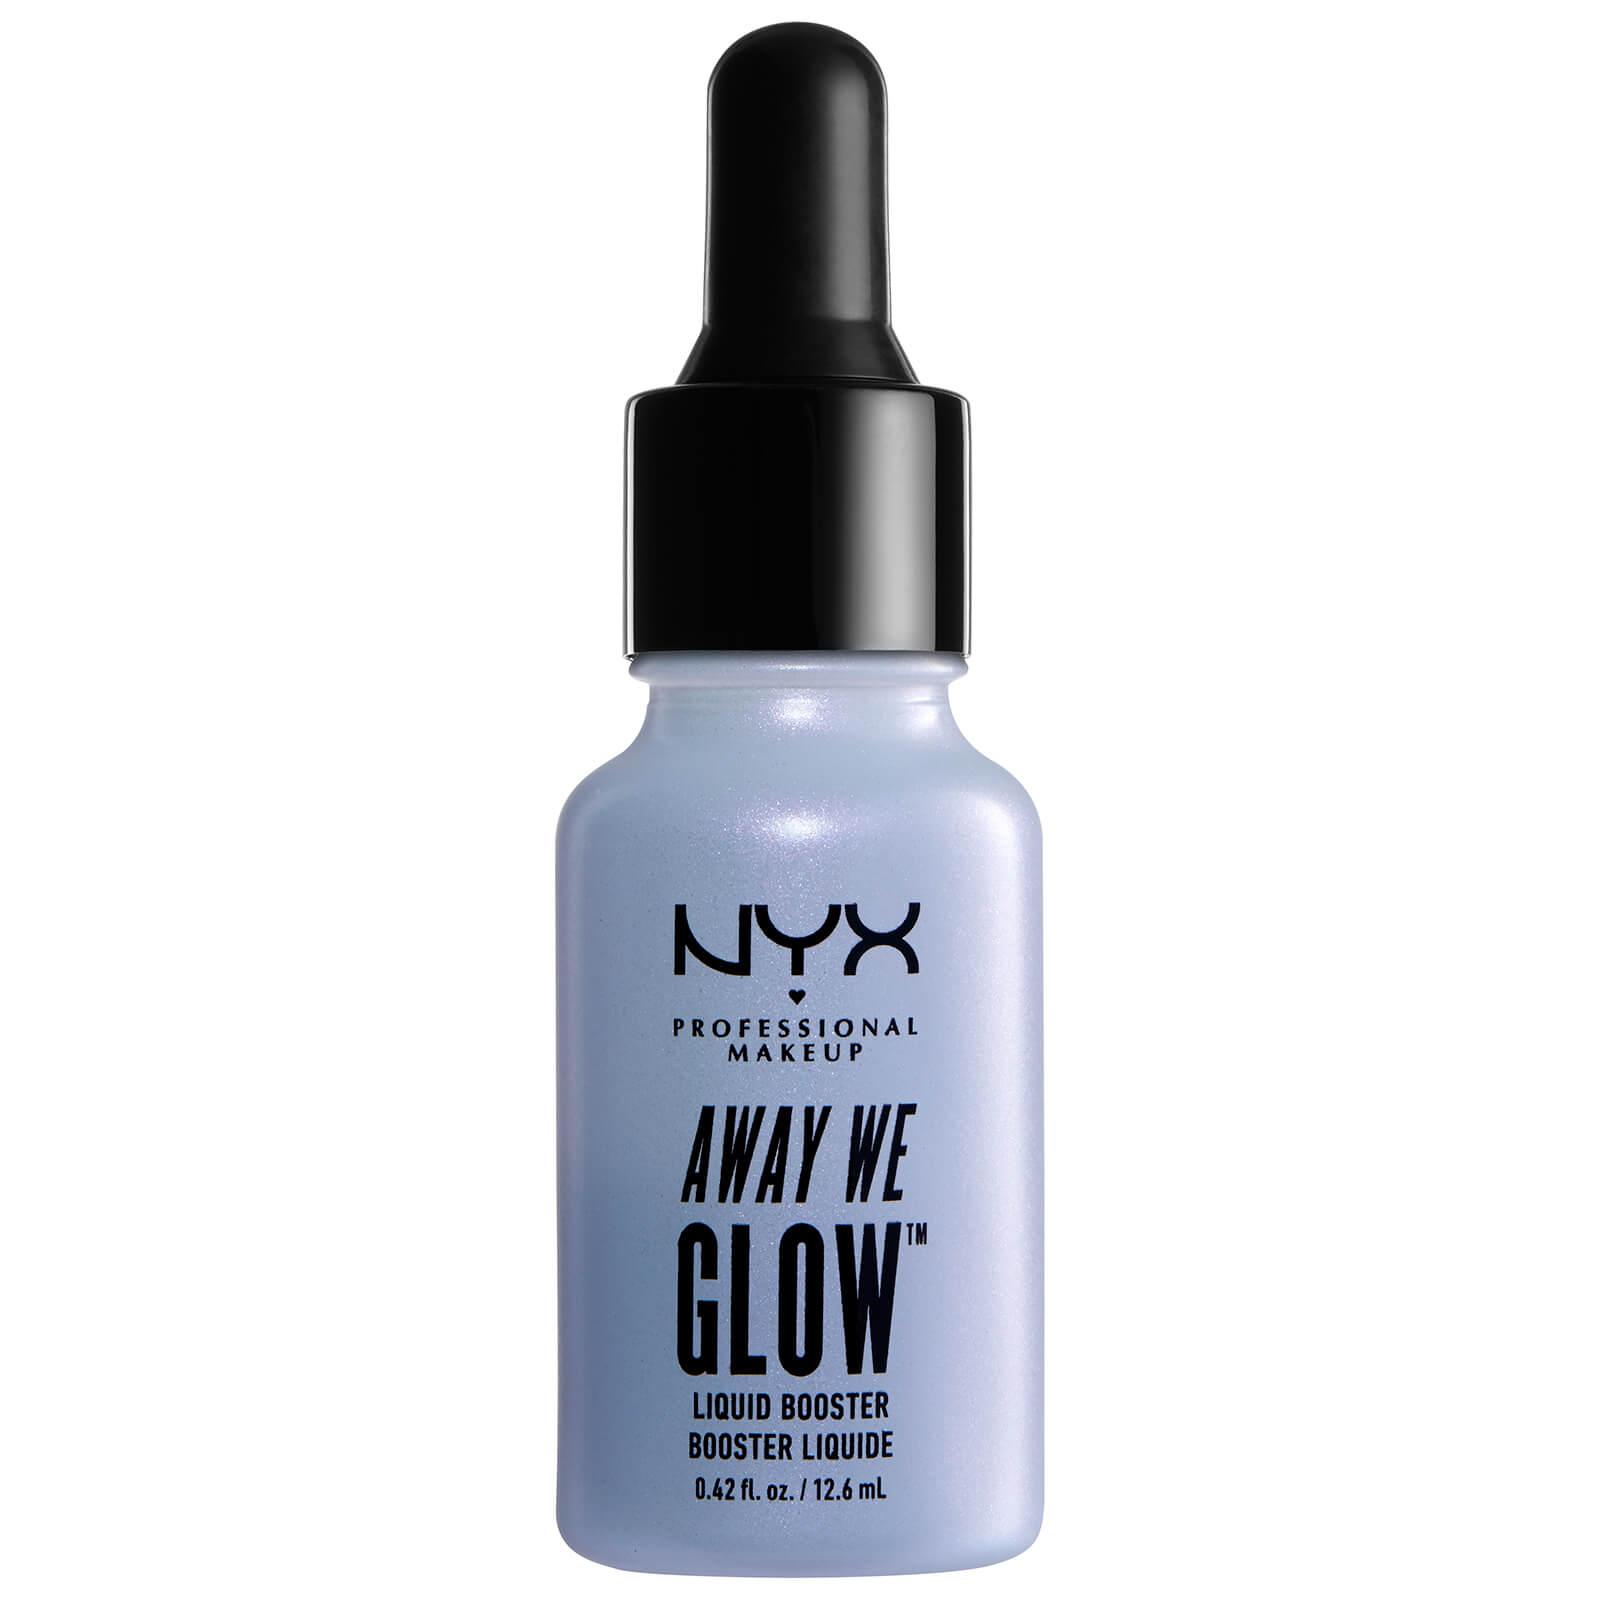 Nyx Professional Makeup Away We Glow Liquid Booster Various Shades Lookfantastic